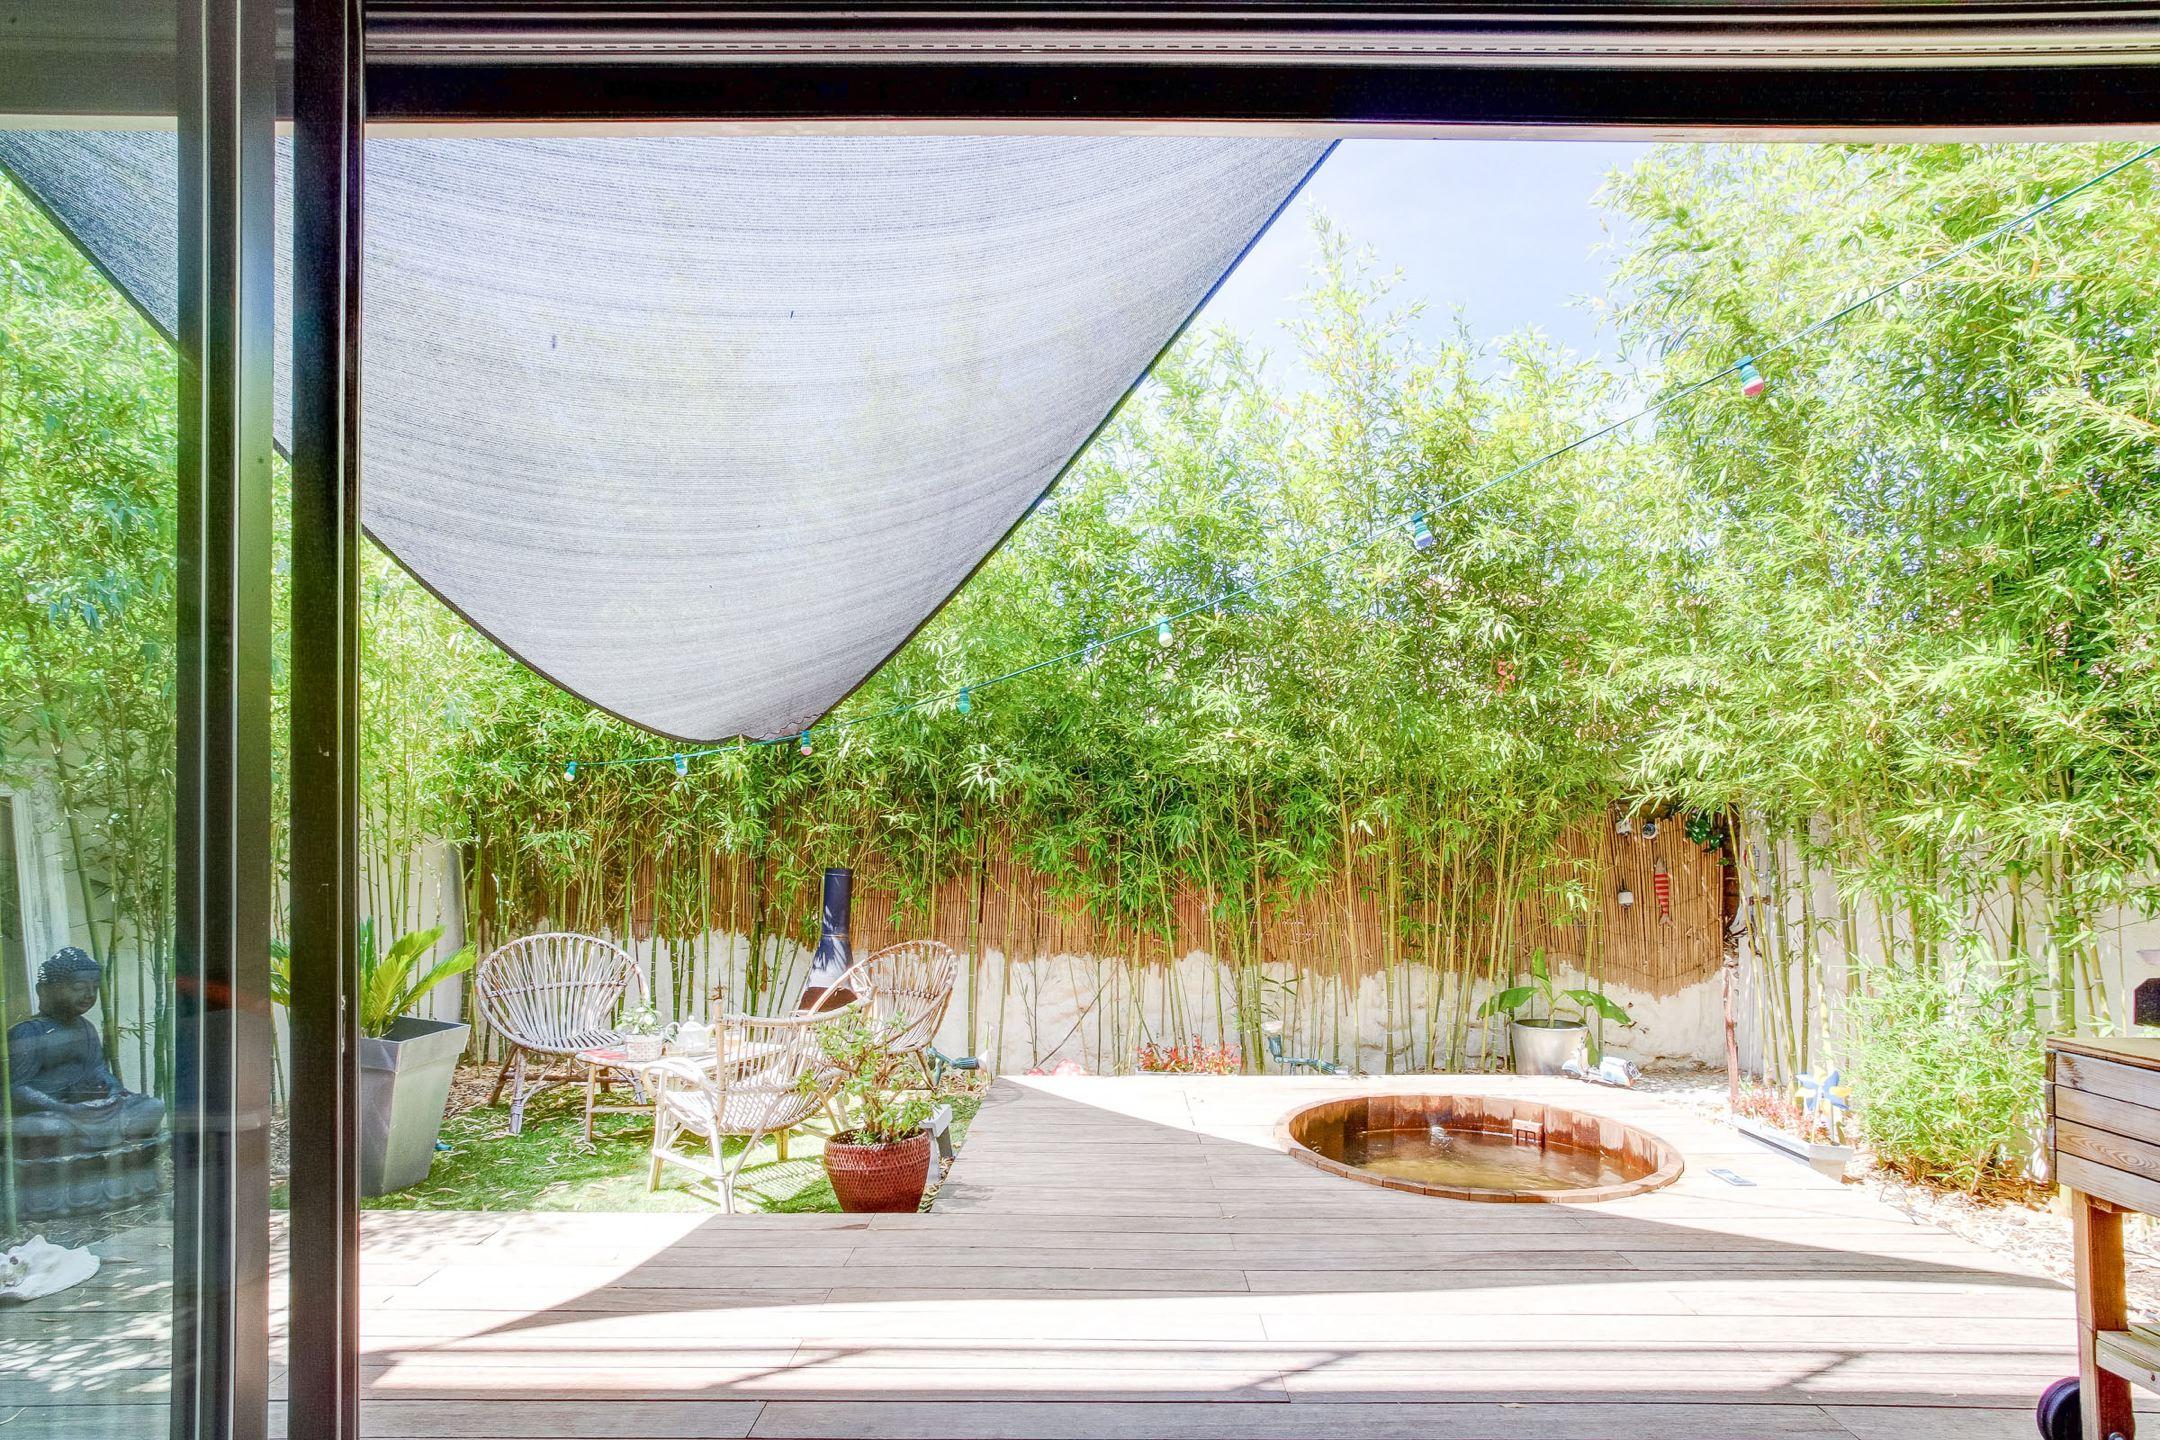 Maison d 39 architecte plein ciel proche du camas ma - Terrasse jardin londrina quadra marseille ...